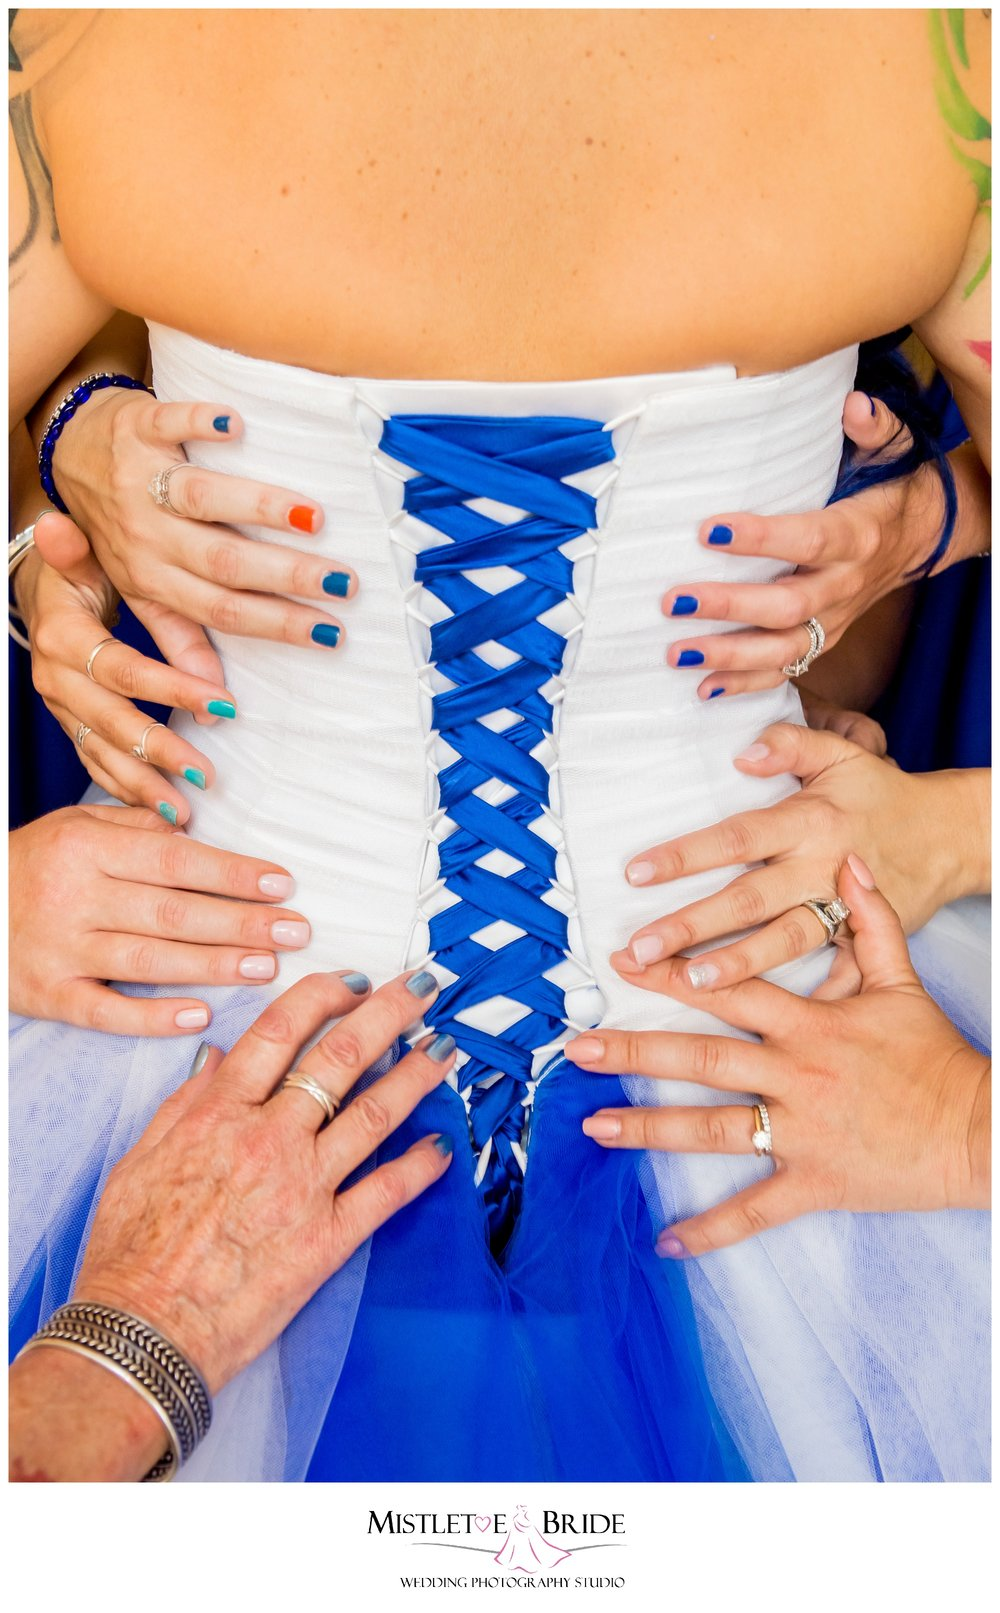 terrace-biagios-wedding-nj-mistletoe-bride-369.JPG